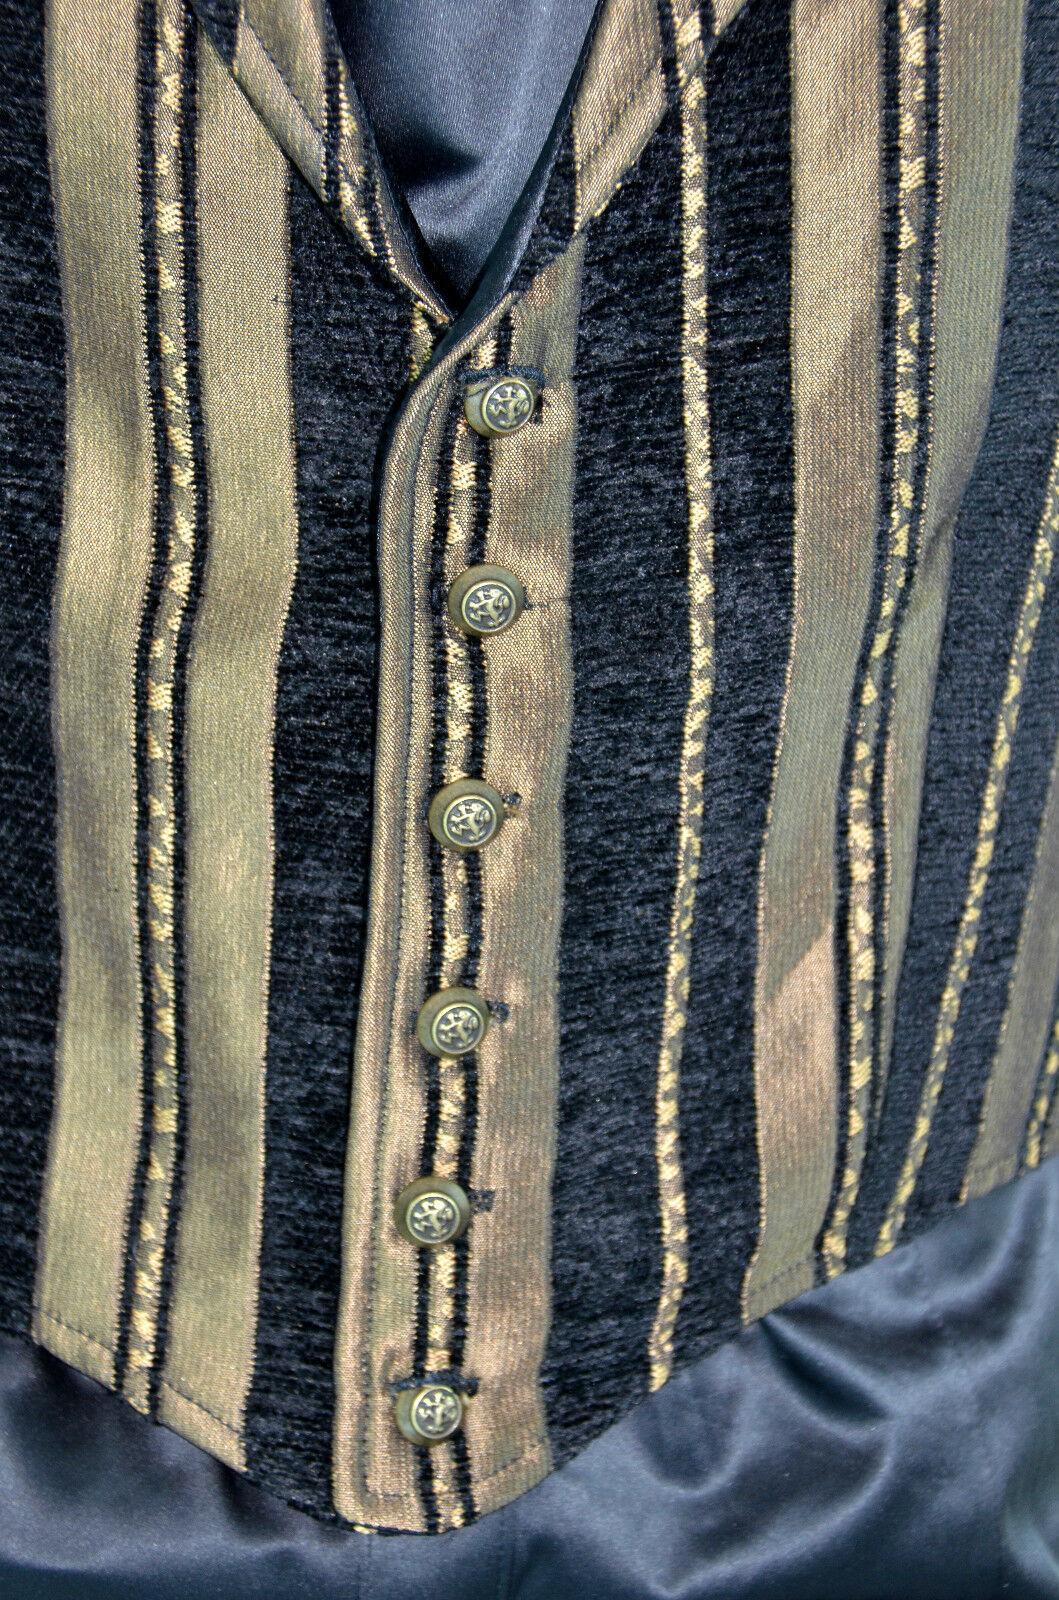 SHRINE GOTHIC ARISTOCRAT VAMPIRE VEST JACKET VICTORIAN TAPESTRY PIRAT STEAMPUNK Clothing, Shoes & Accessories